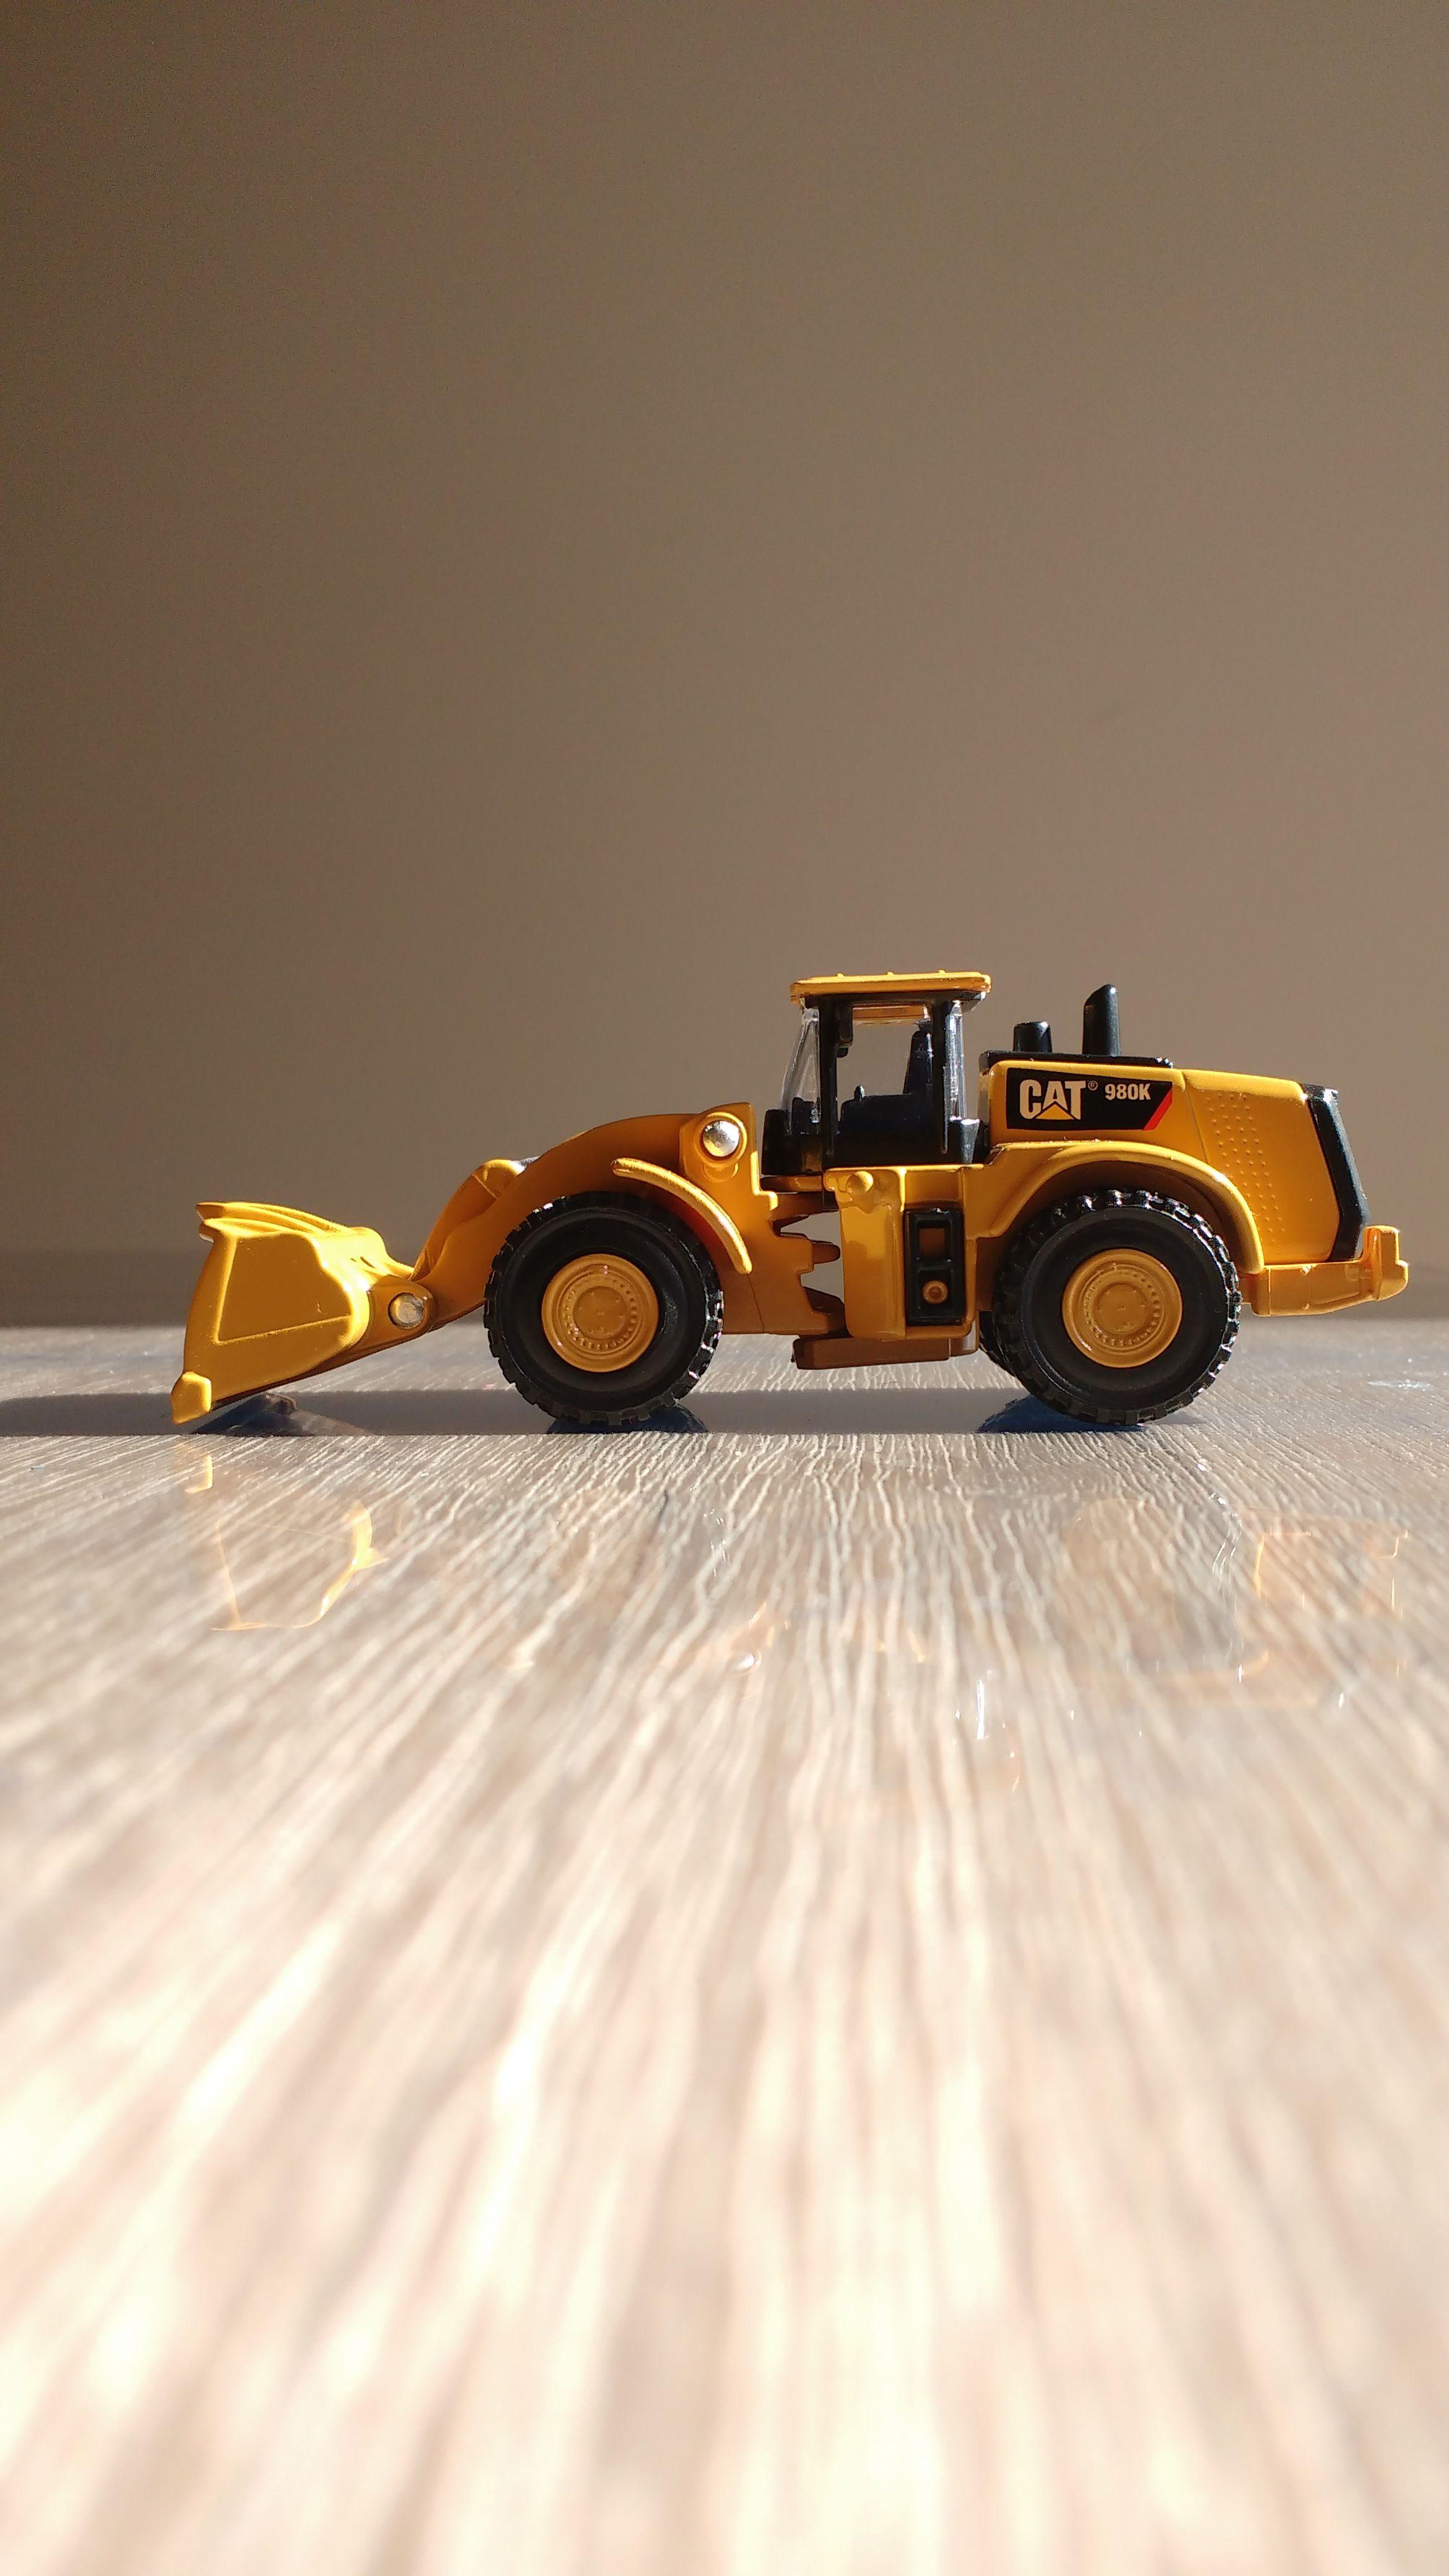 #980K #CAT #Caterpiller #Diecastmodels #CATModels #Construction #Mining #Frontloader #1:100